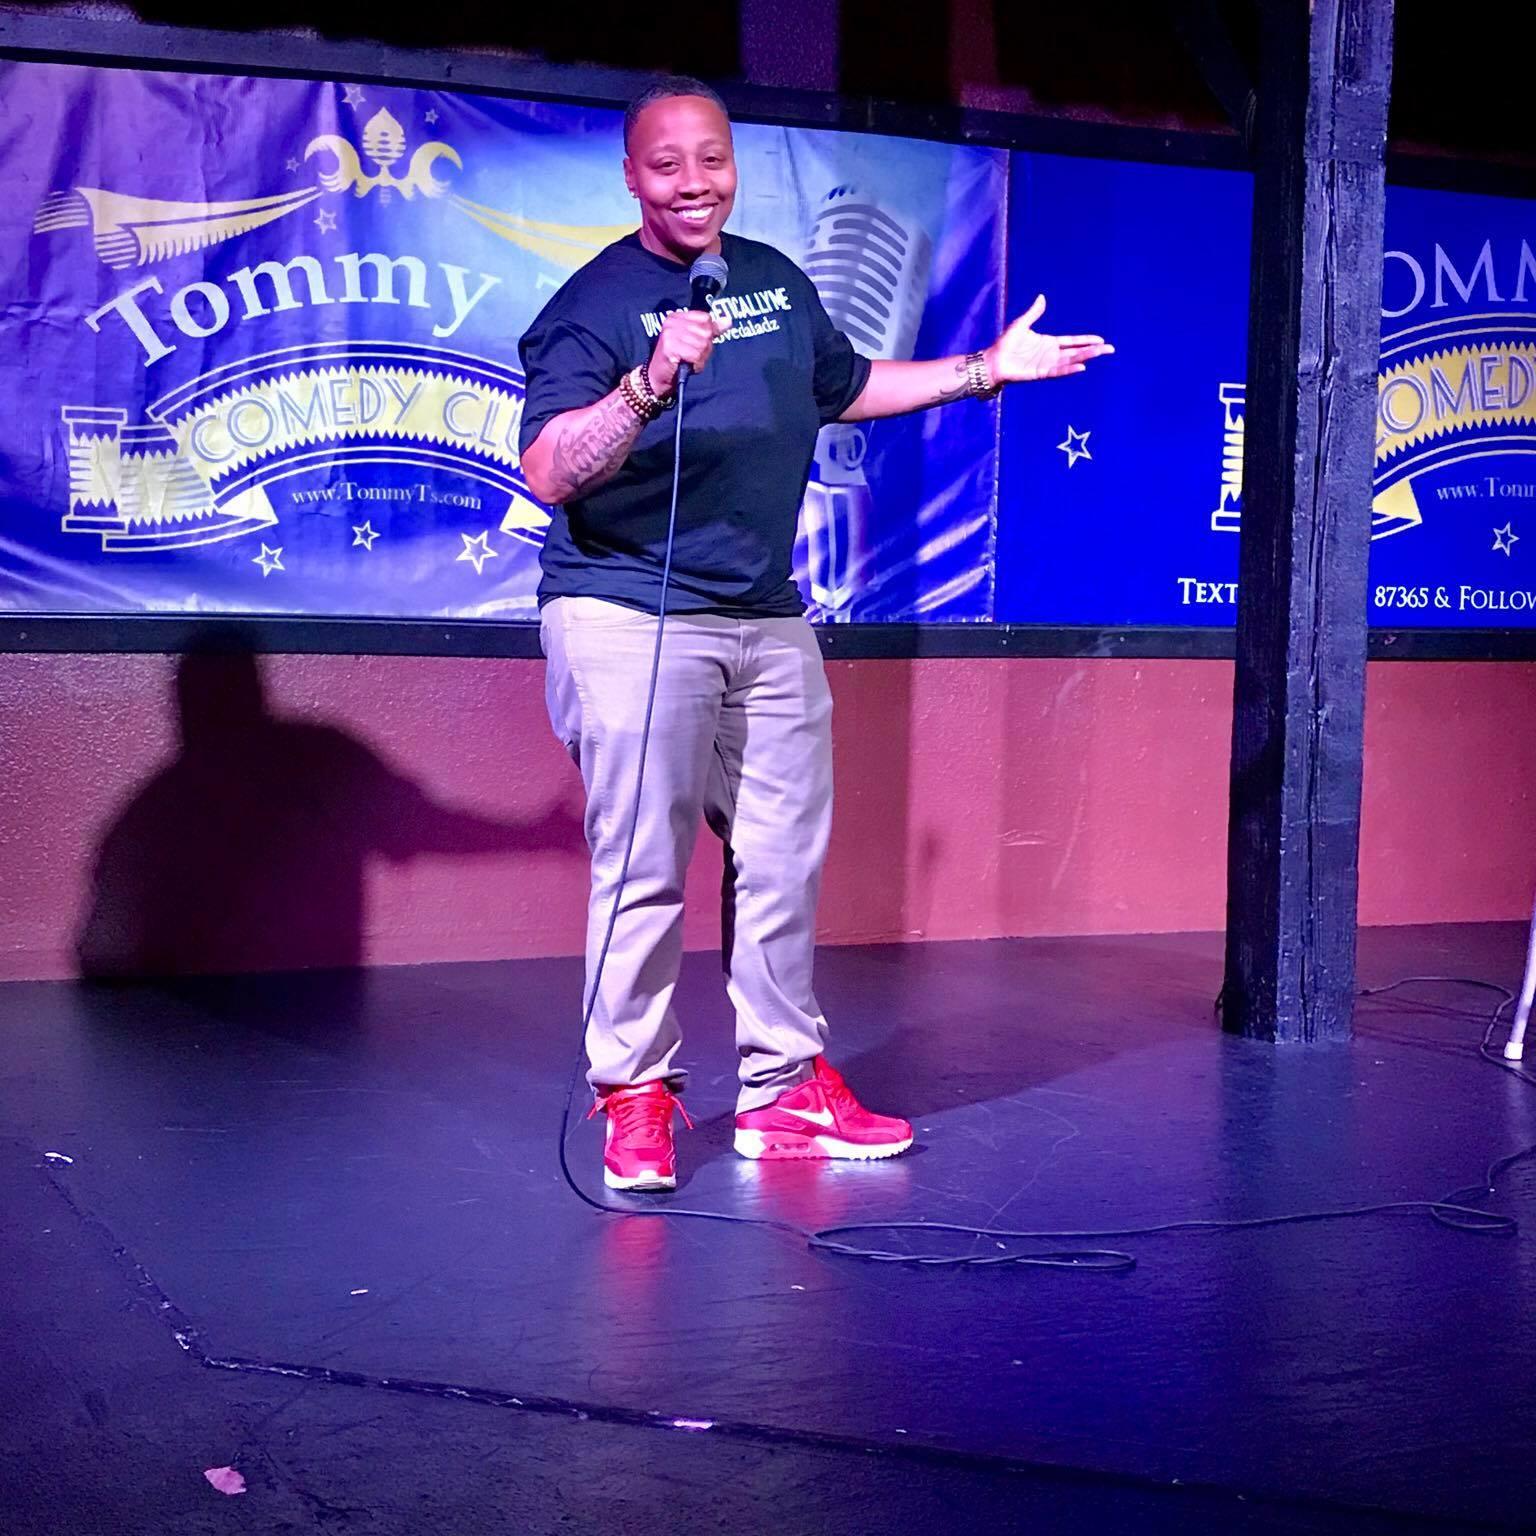 TommyT's Comedy Club Mo'Nique